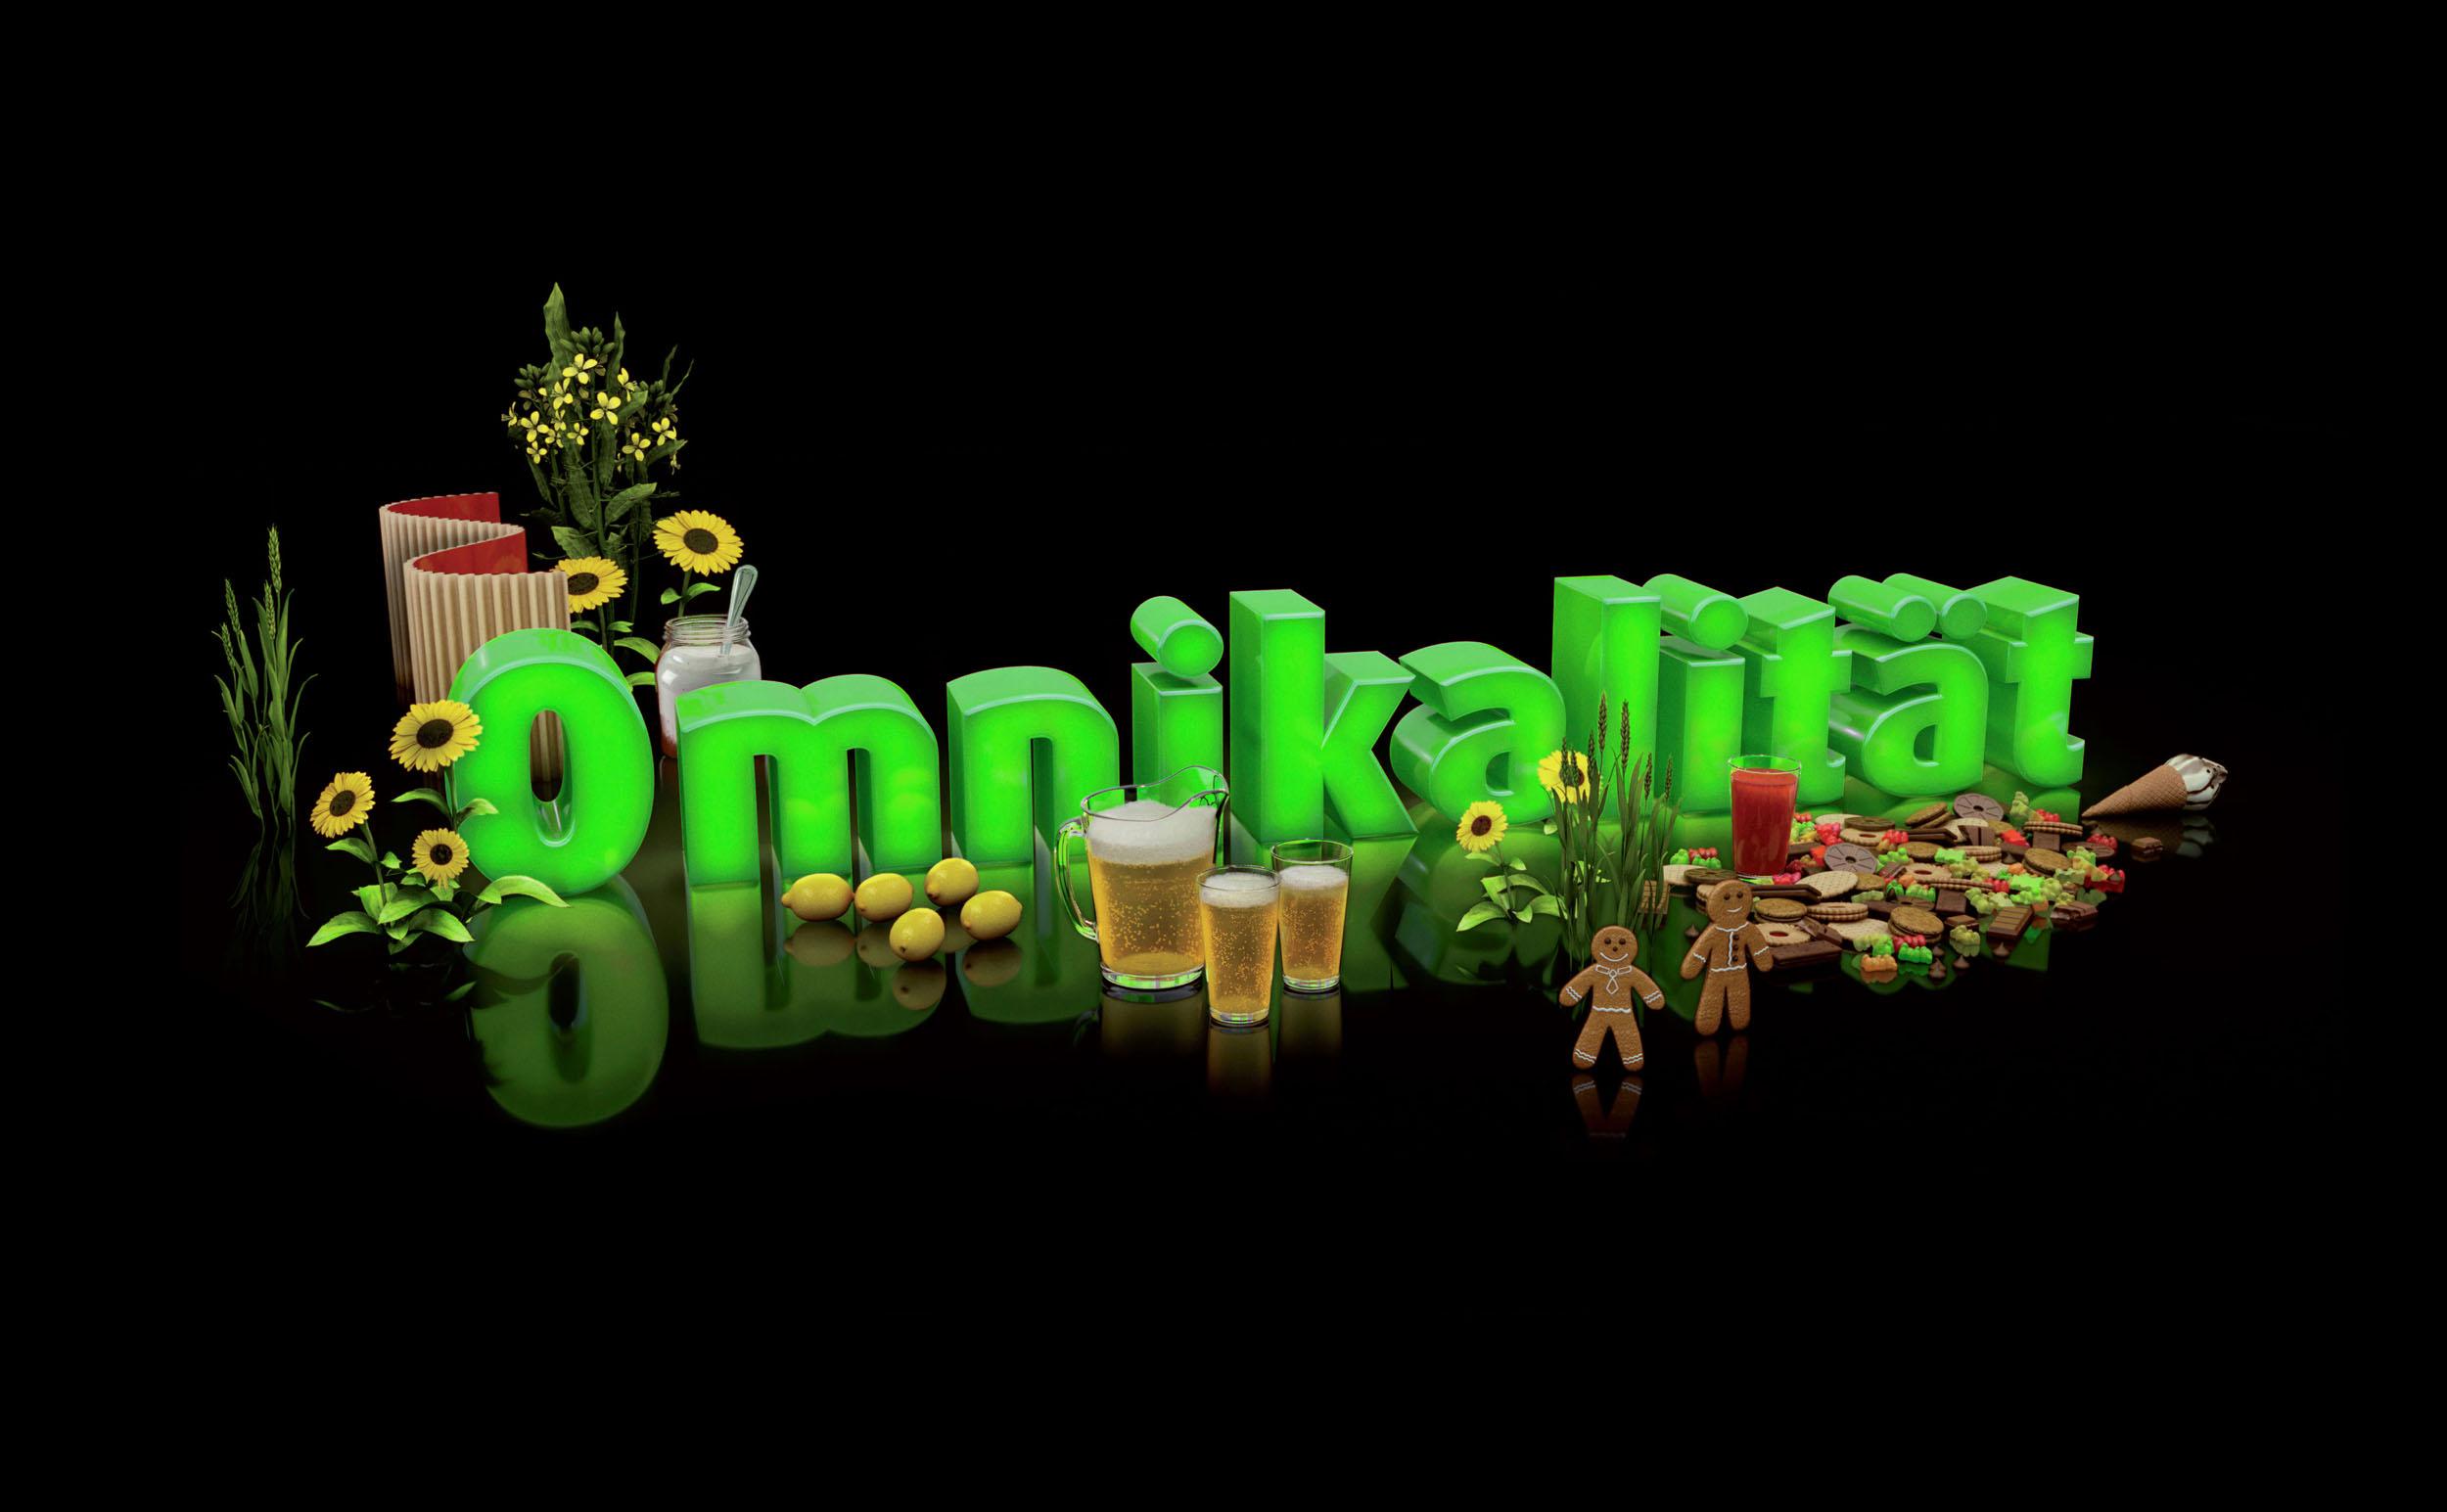 BOOM_CGI_PRODUCT_cargill-omnikalitat.jpg